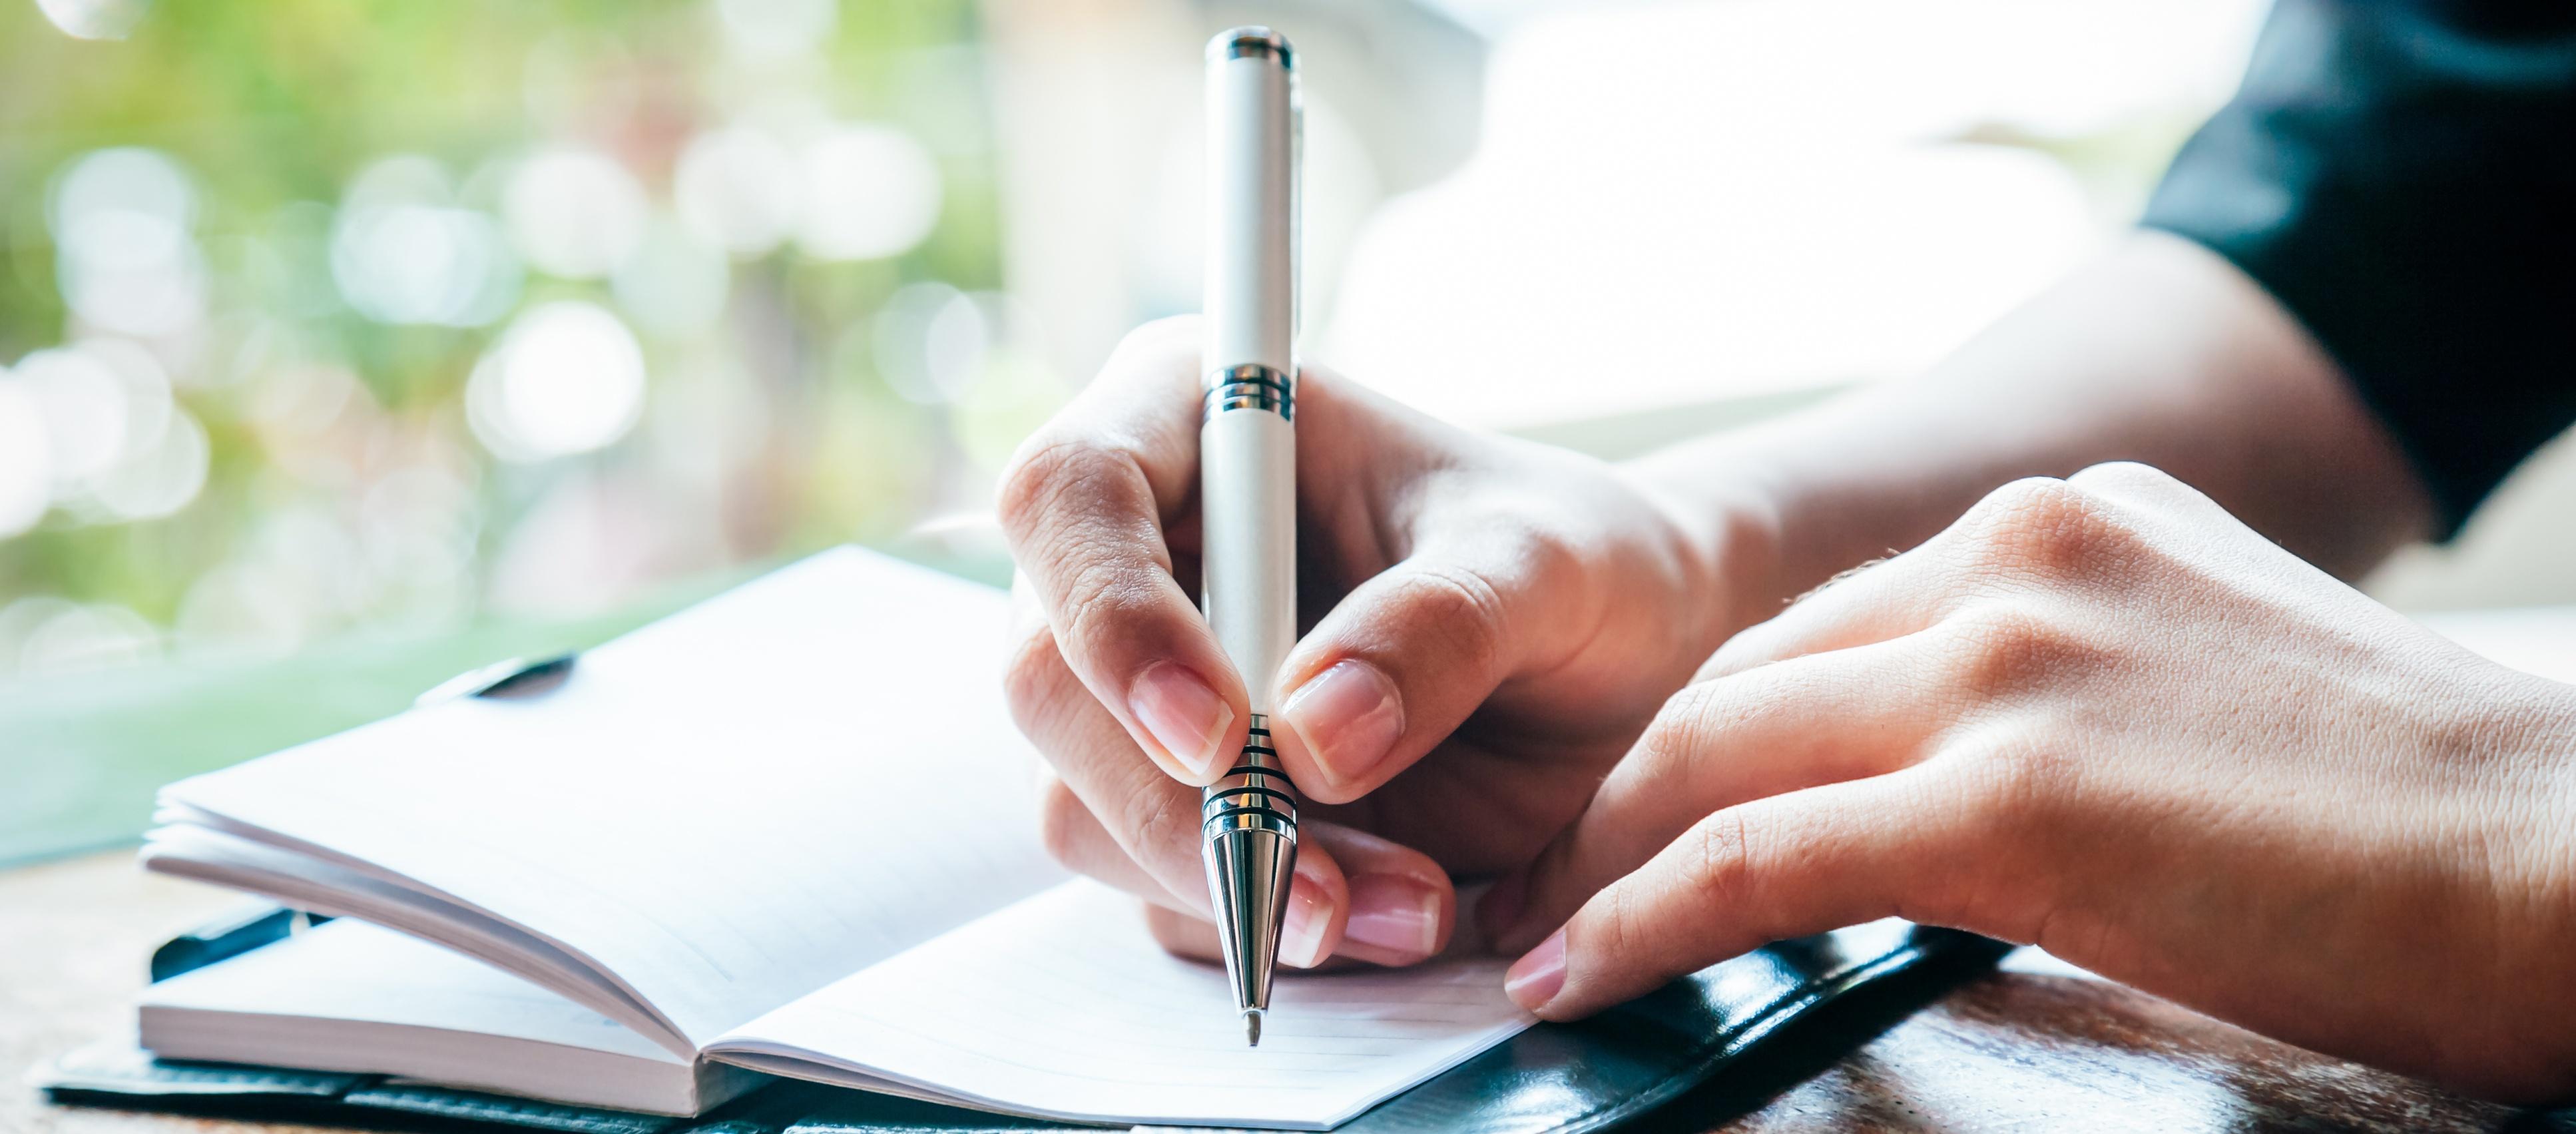 writing down goals